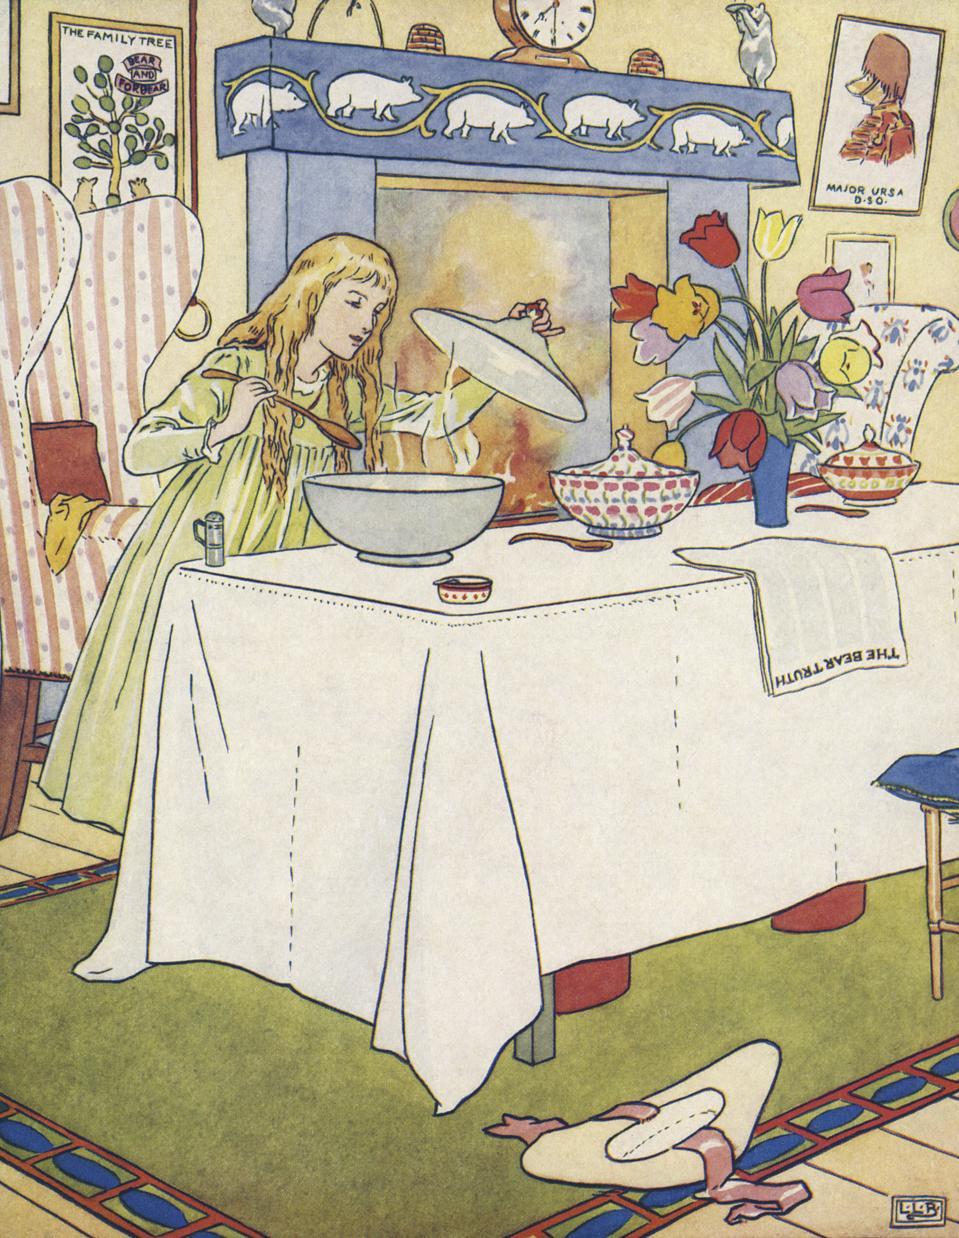 The Three Bears Goldenlocks / Goldilocks tasting their porridge